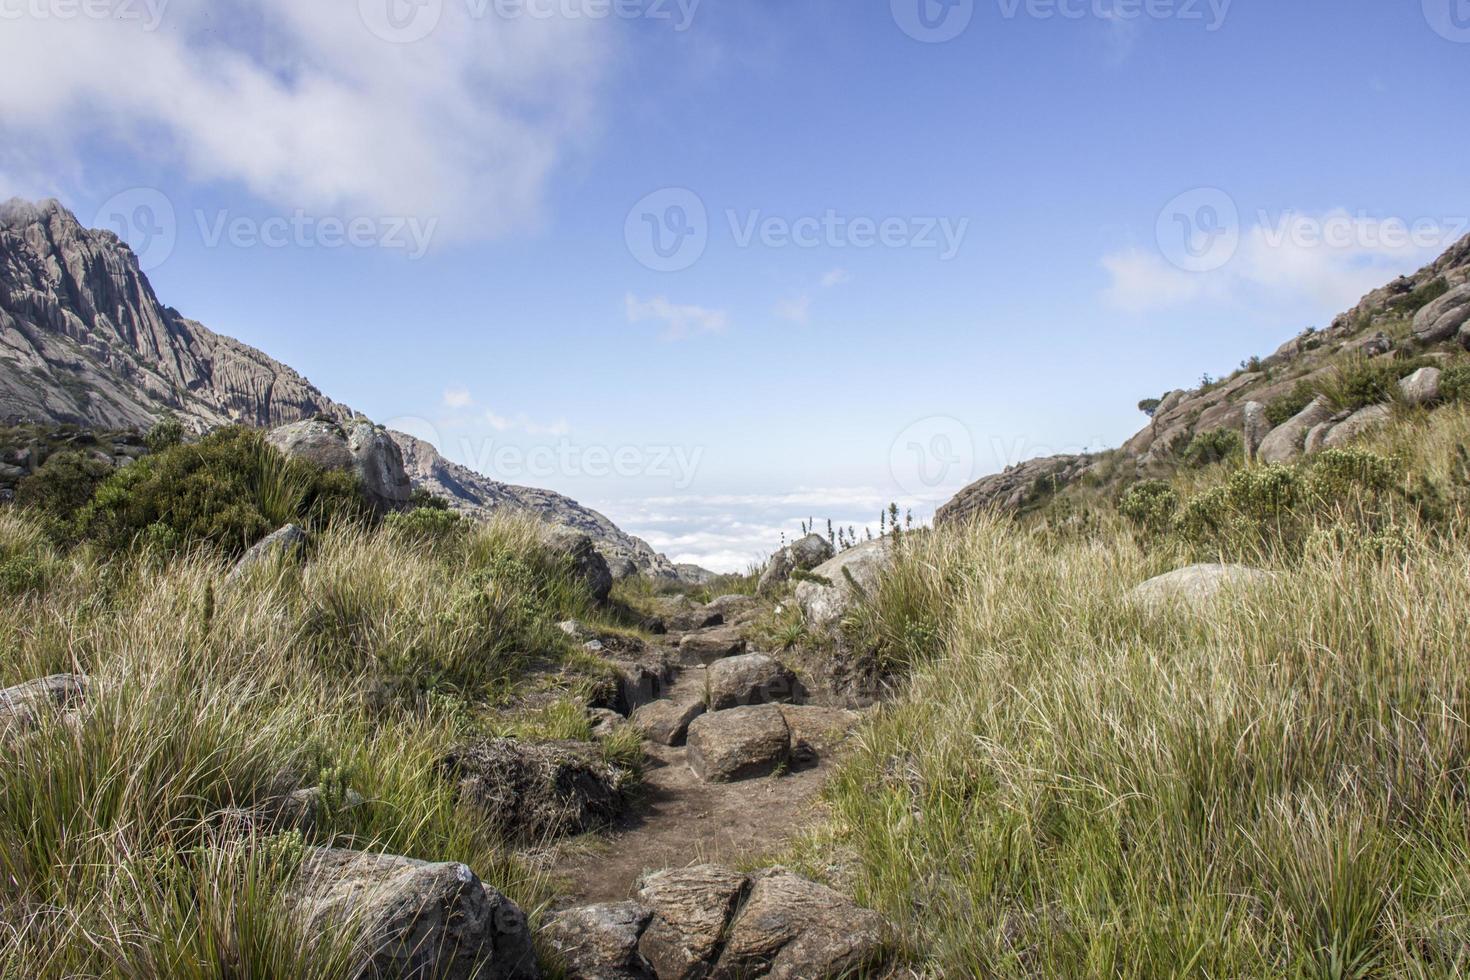 through the trails of Itatiaia photo